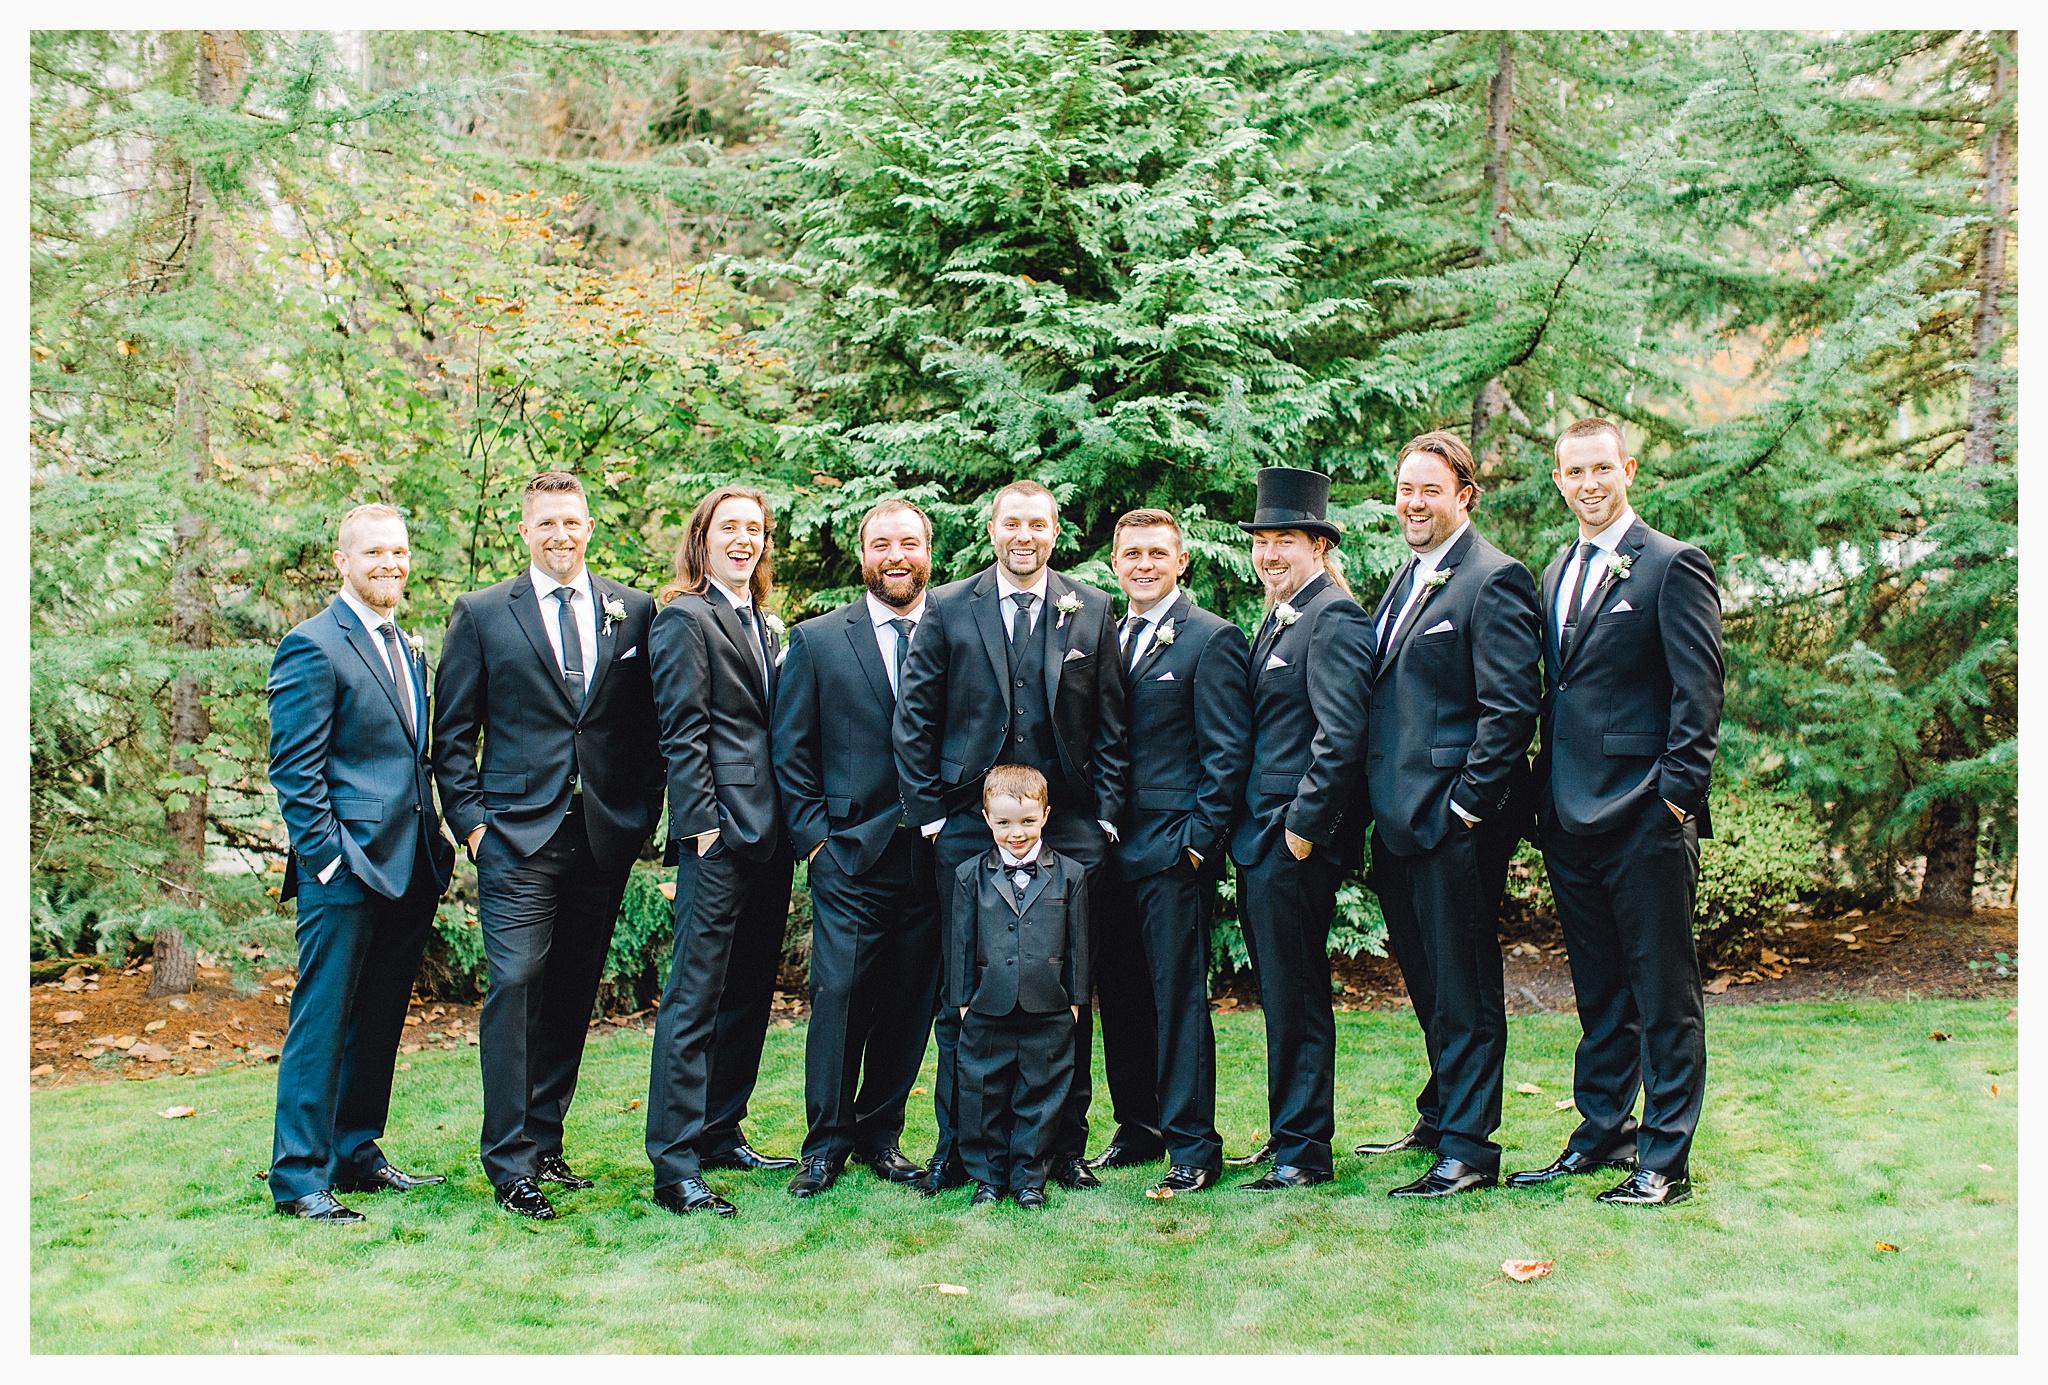 Emma Rose Company Light and Airy Wedding Photographer, Beautiful fall wedding at Rock Creek Gardens Venue in Puyallup, Washington._0050.jpg